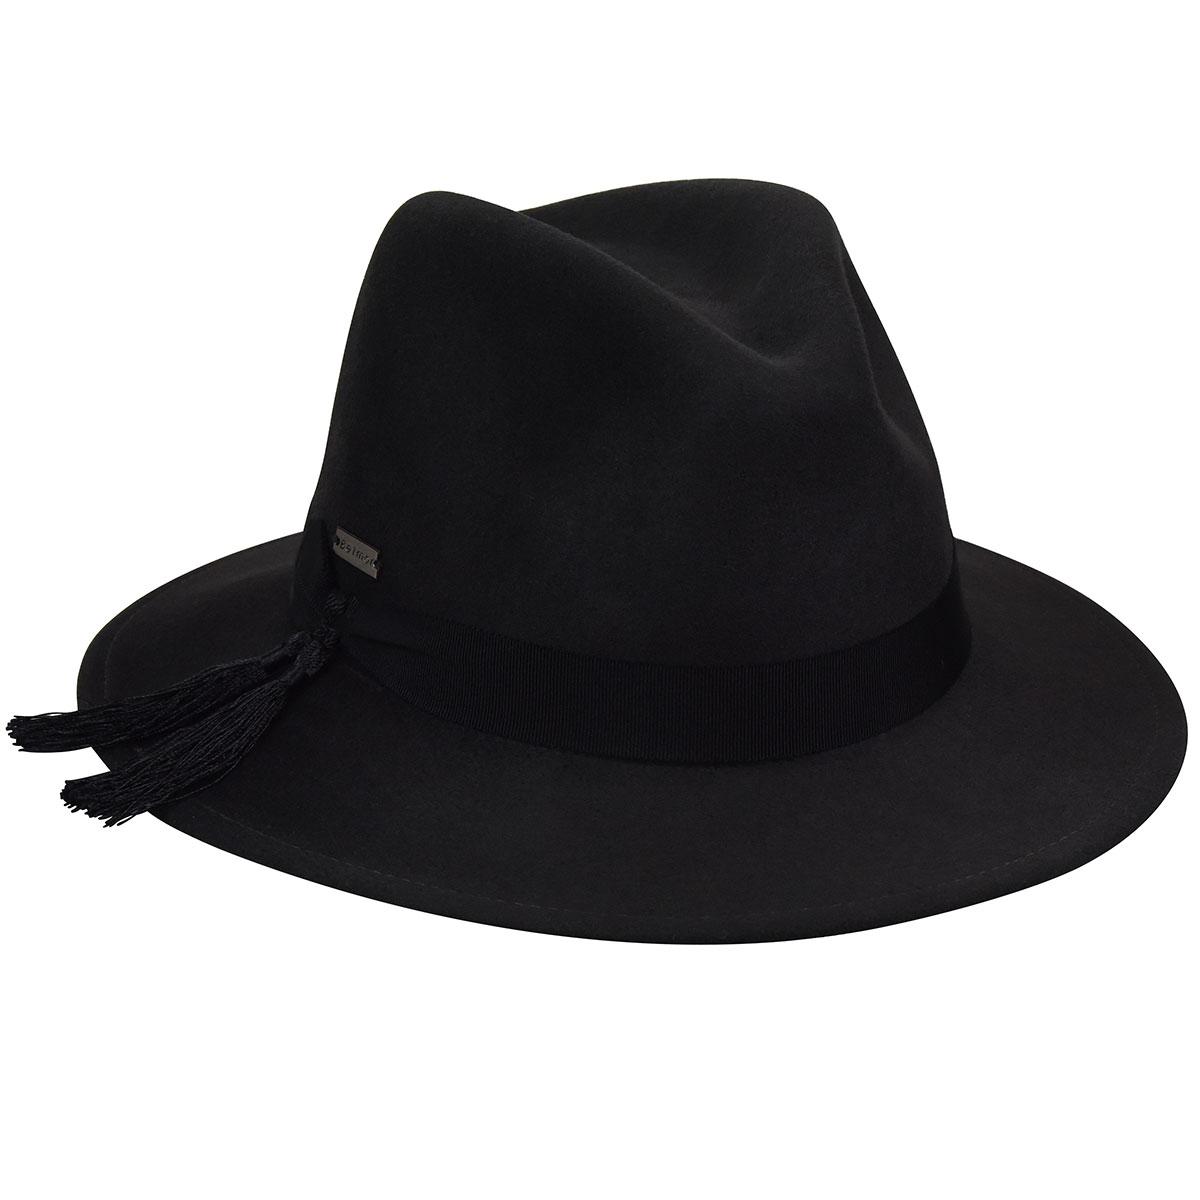 1940s Hats History Ashland Fedora $105.00 AT vintagedancer.com